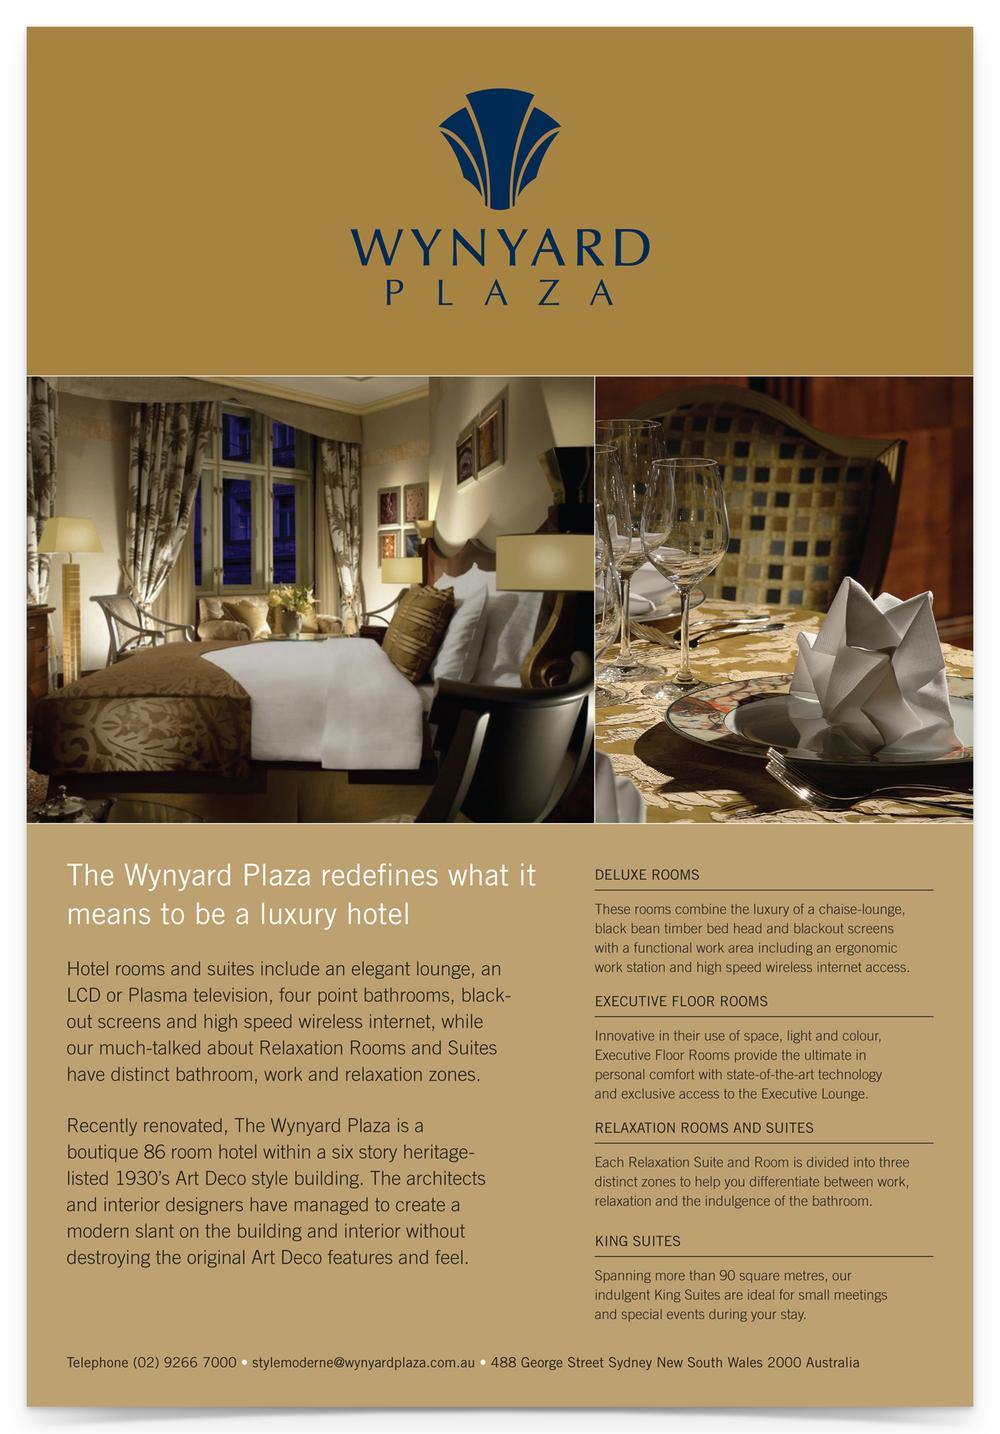 wynyard-plaza-brochure-front.jpg